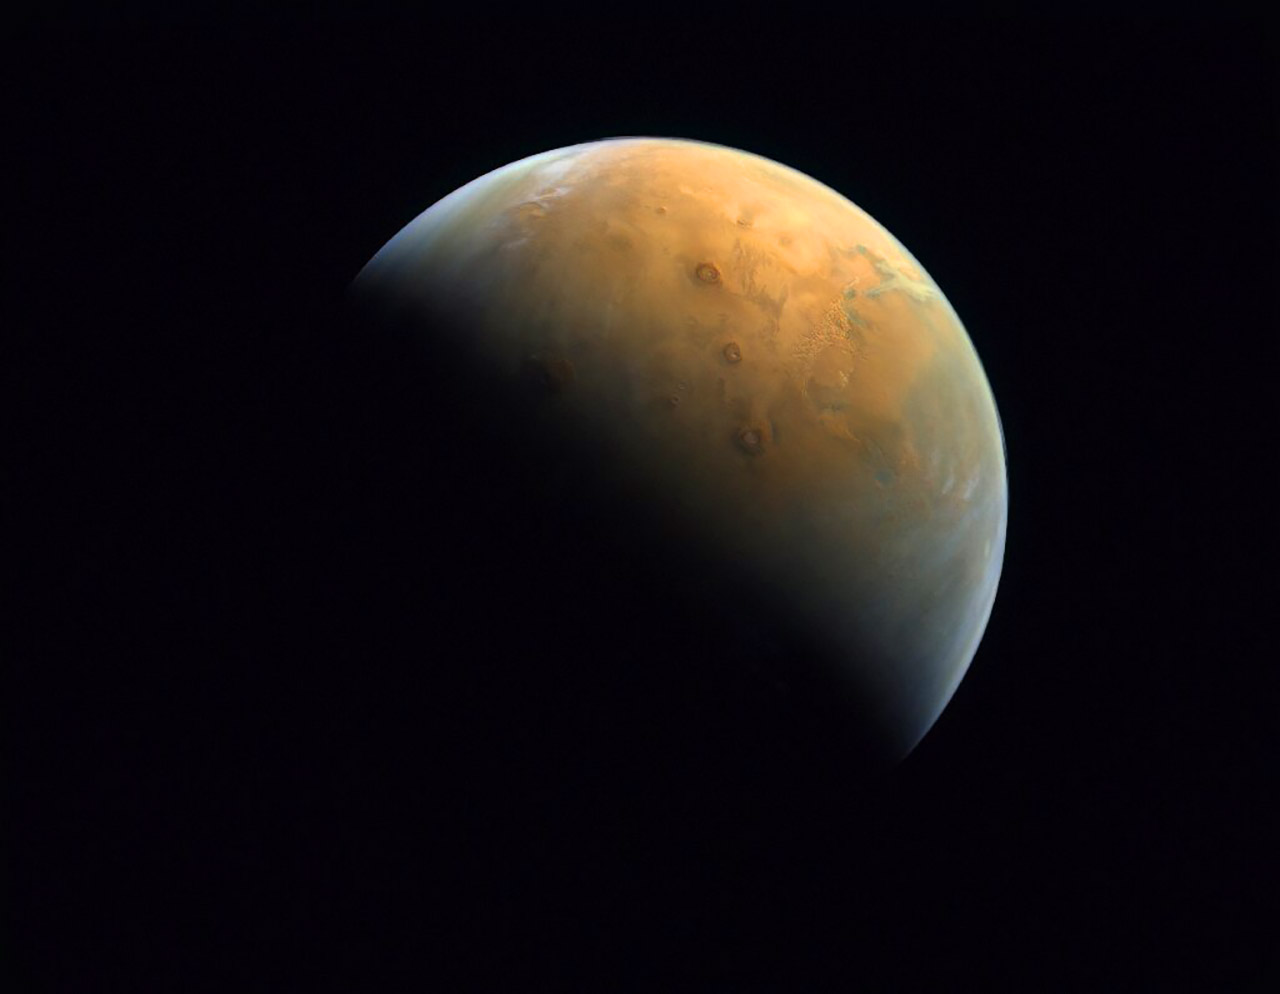 Emirates Mars Mission UAE Hope Probe Picture